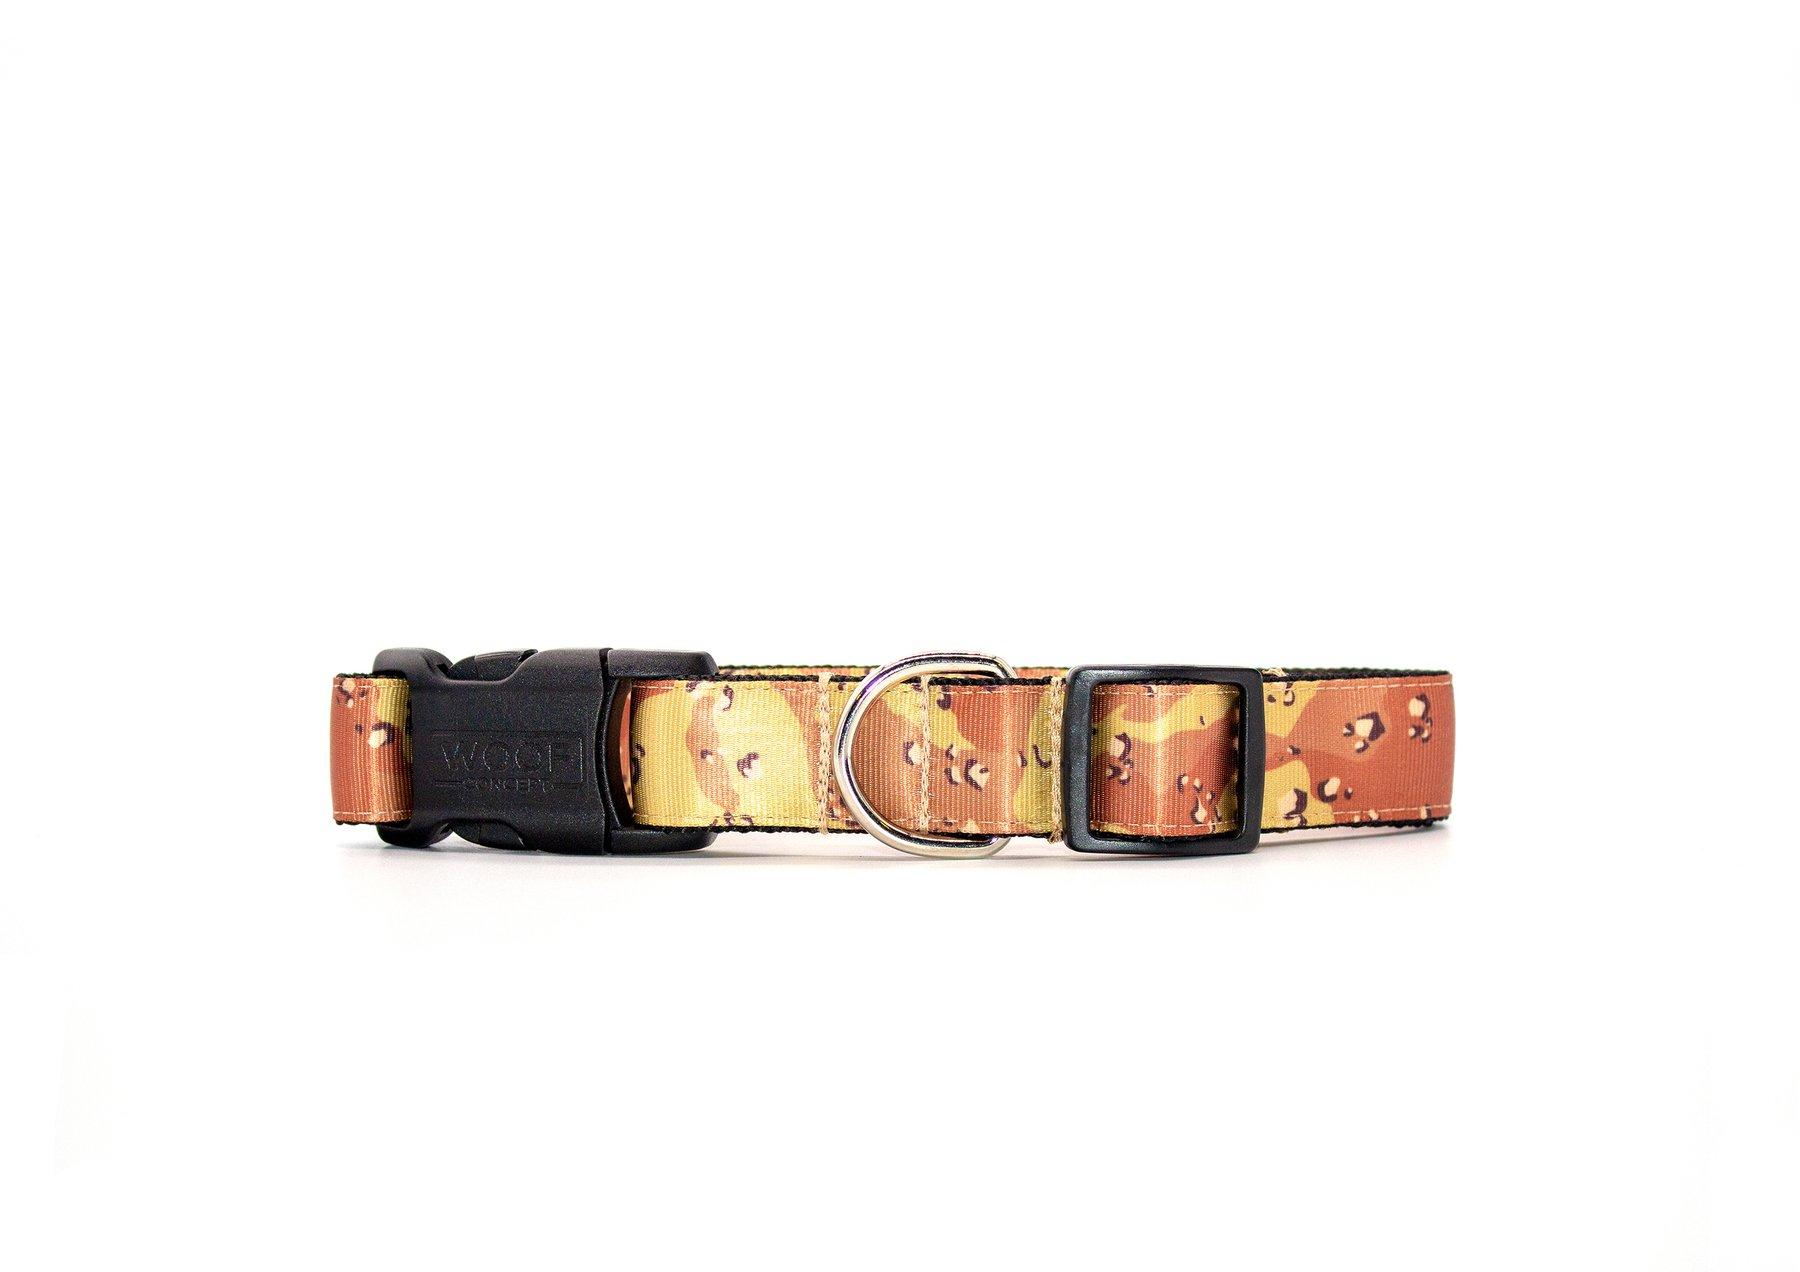 Woof Concept Dog Collar, Desert Camo, Medium